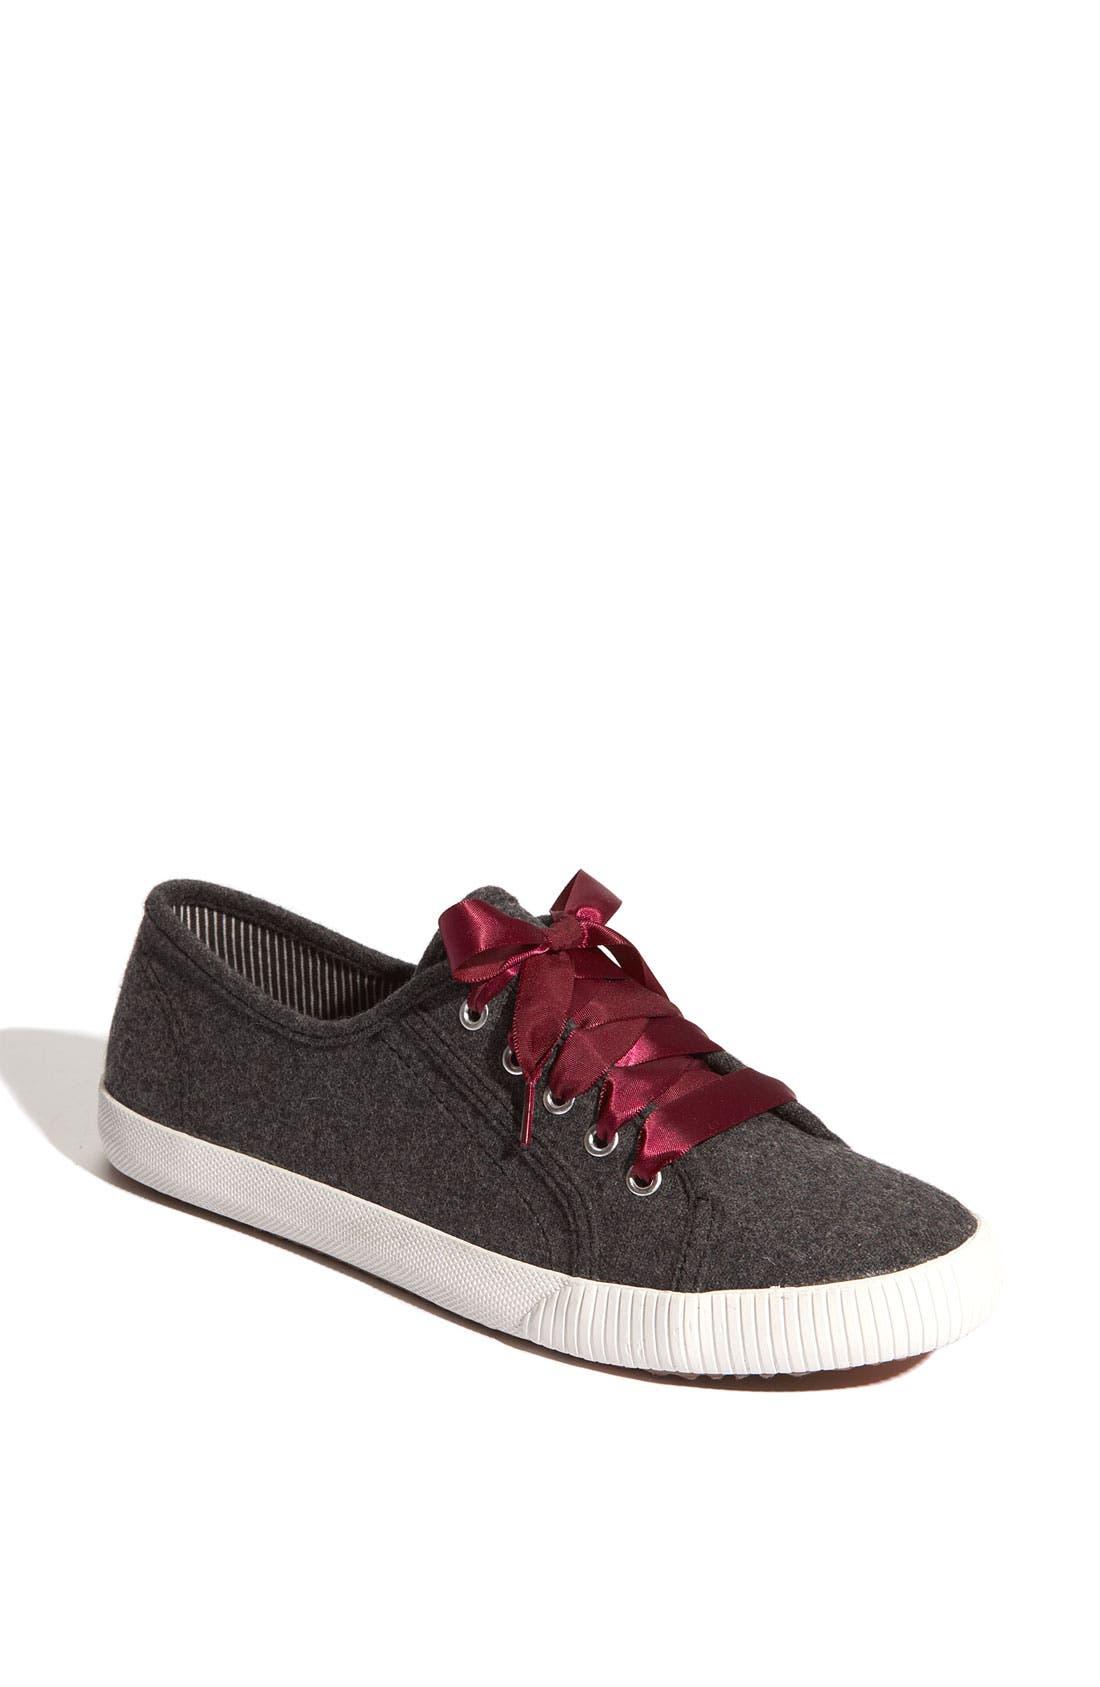 Alternate Image 1 Selected - Keds® 'Champion - Celeb Wooly' Sneaker